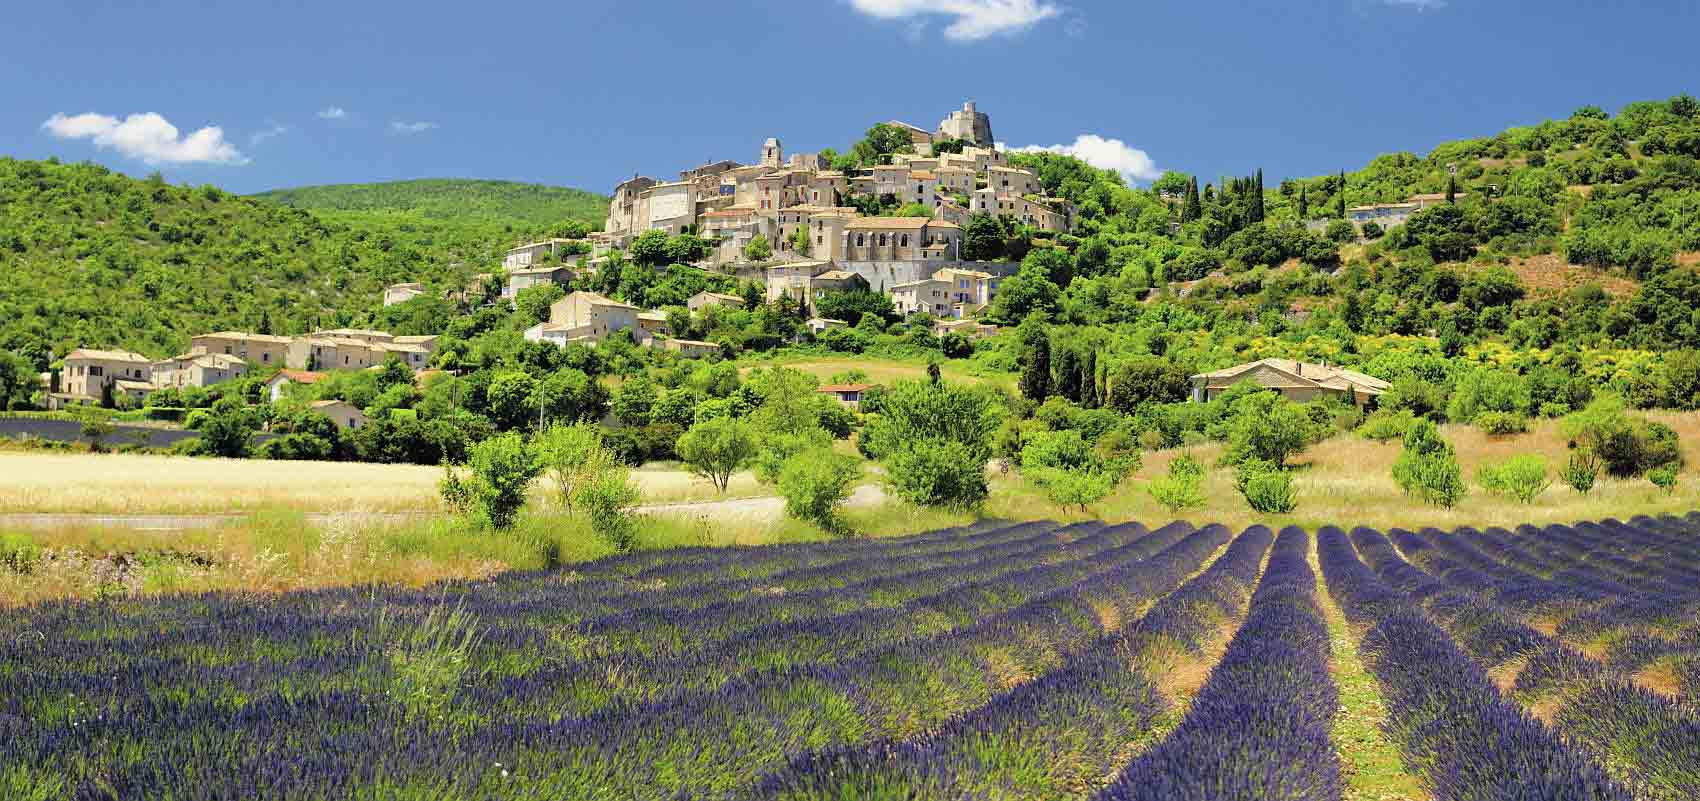 B&B Gites Haute Provence bij Sisteron Les Glycines